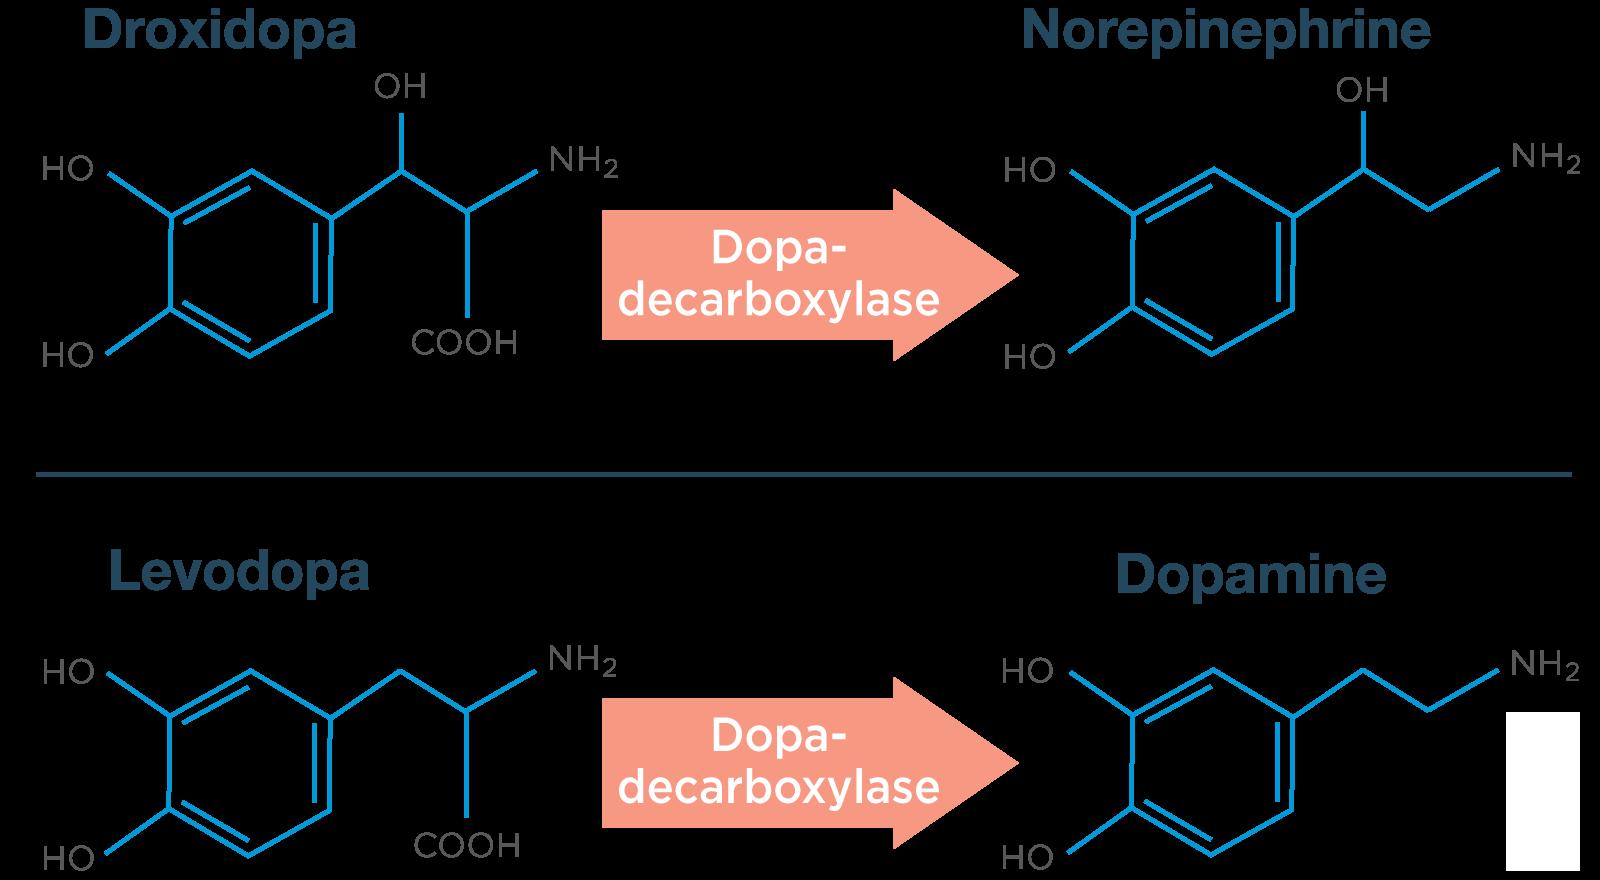 NORTHERA® (droxidopa) | Pharmacology